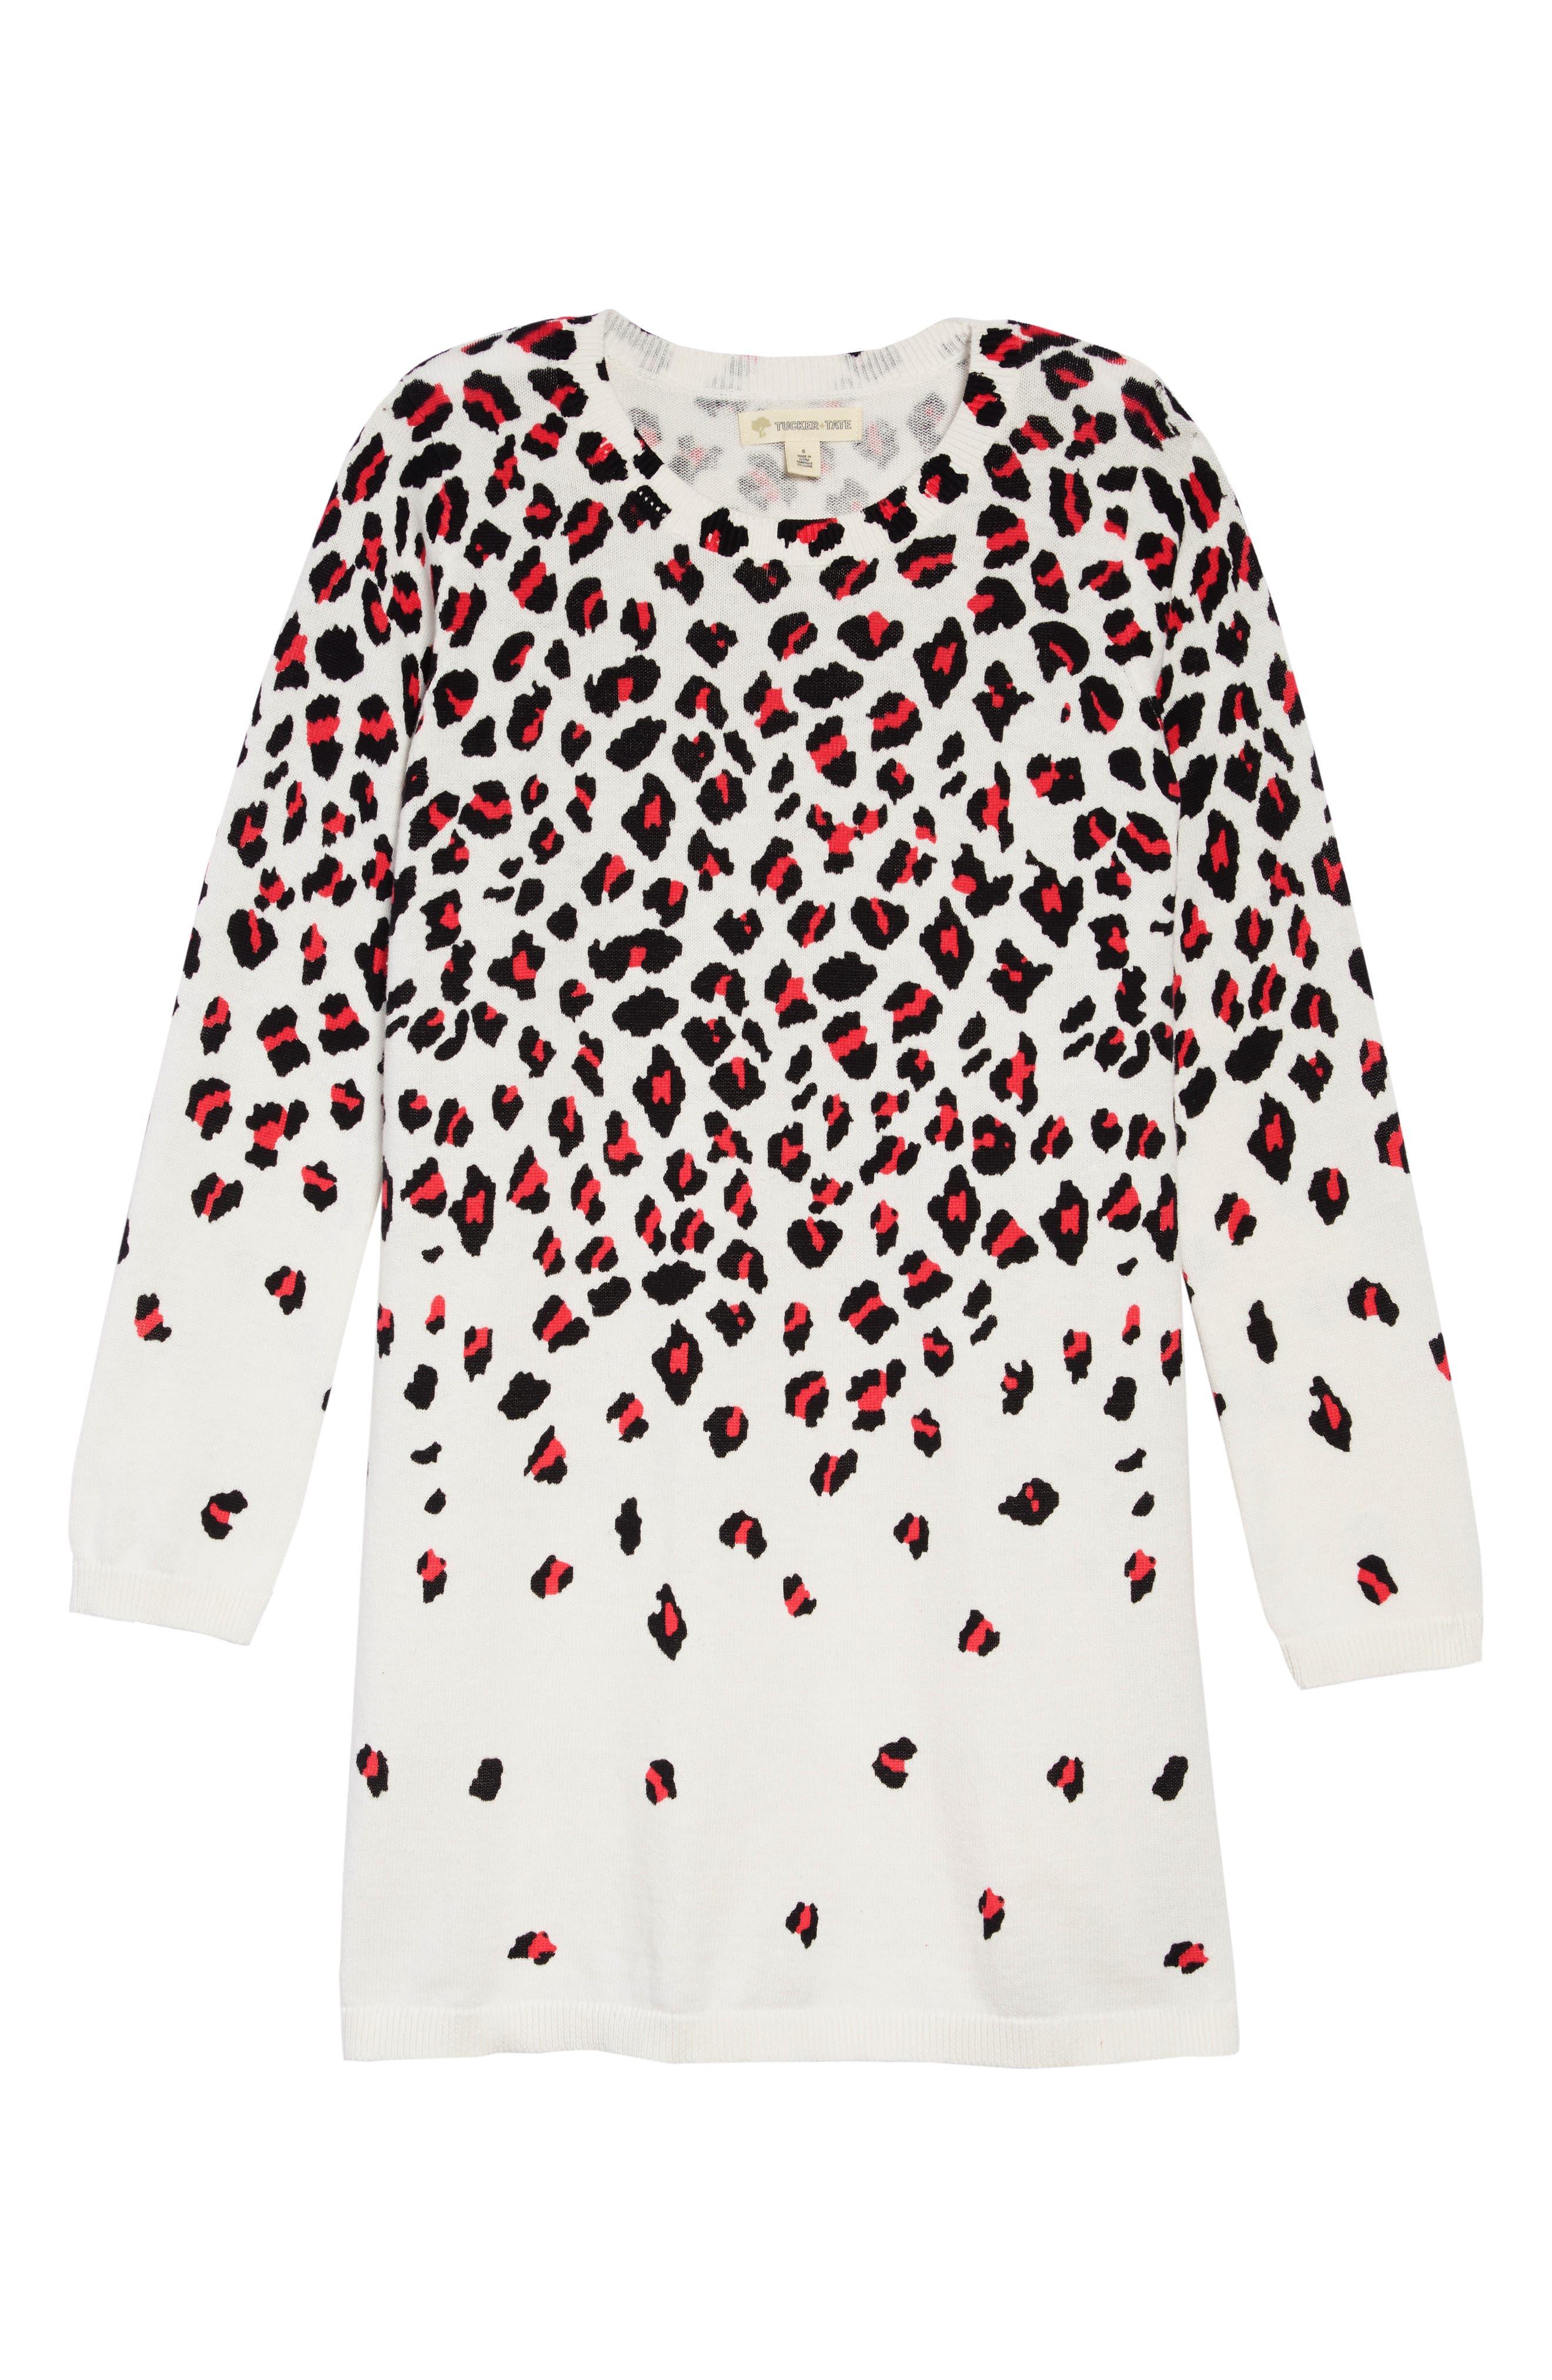 Sweater Dress,                             Main thumbnail 1, color,                             IVORY EGRET CHEETAH